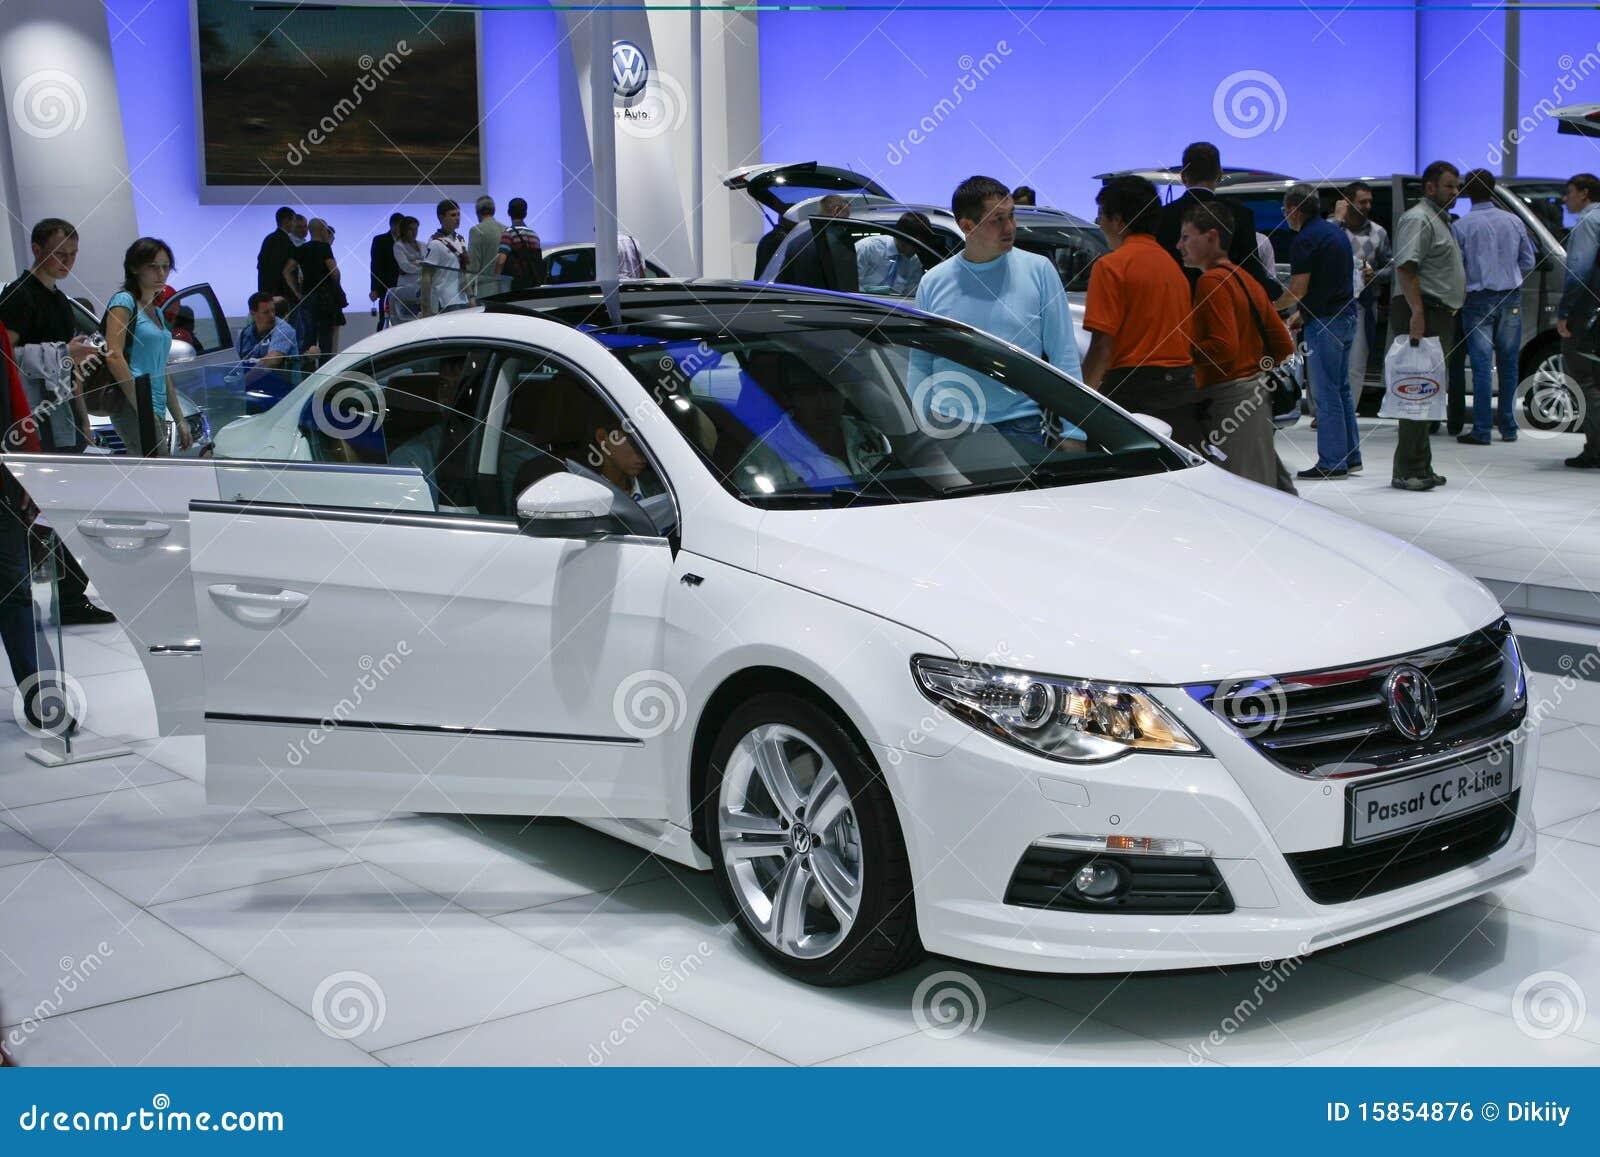 Volkswagen Passat CC R-Line Editorial Photo - Image: 15854876